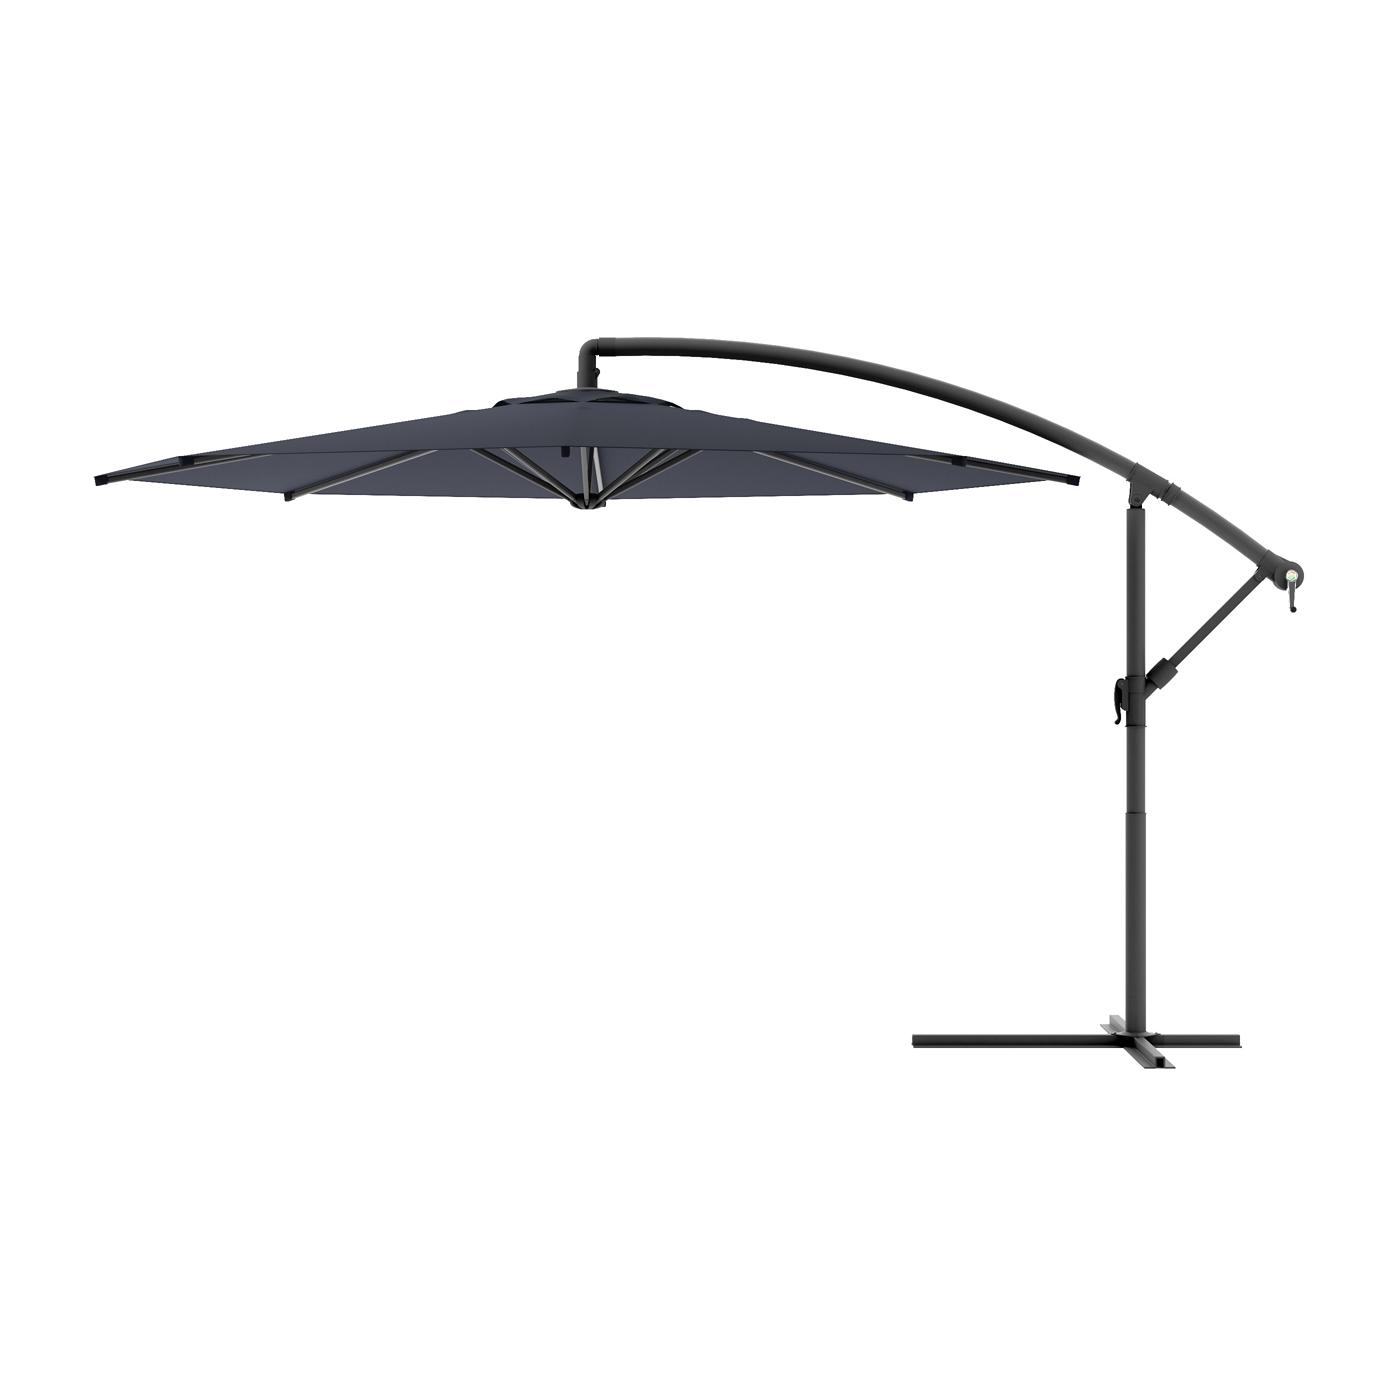 Black And White Patio Umbrellas Regarding Newest Corliving Ppu 4 Cantilever Patio Umbrella (View 5 of 20)